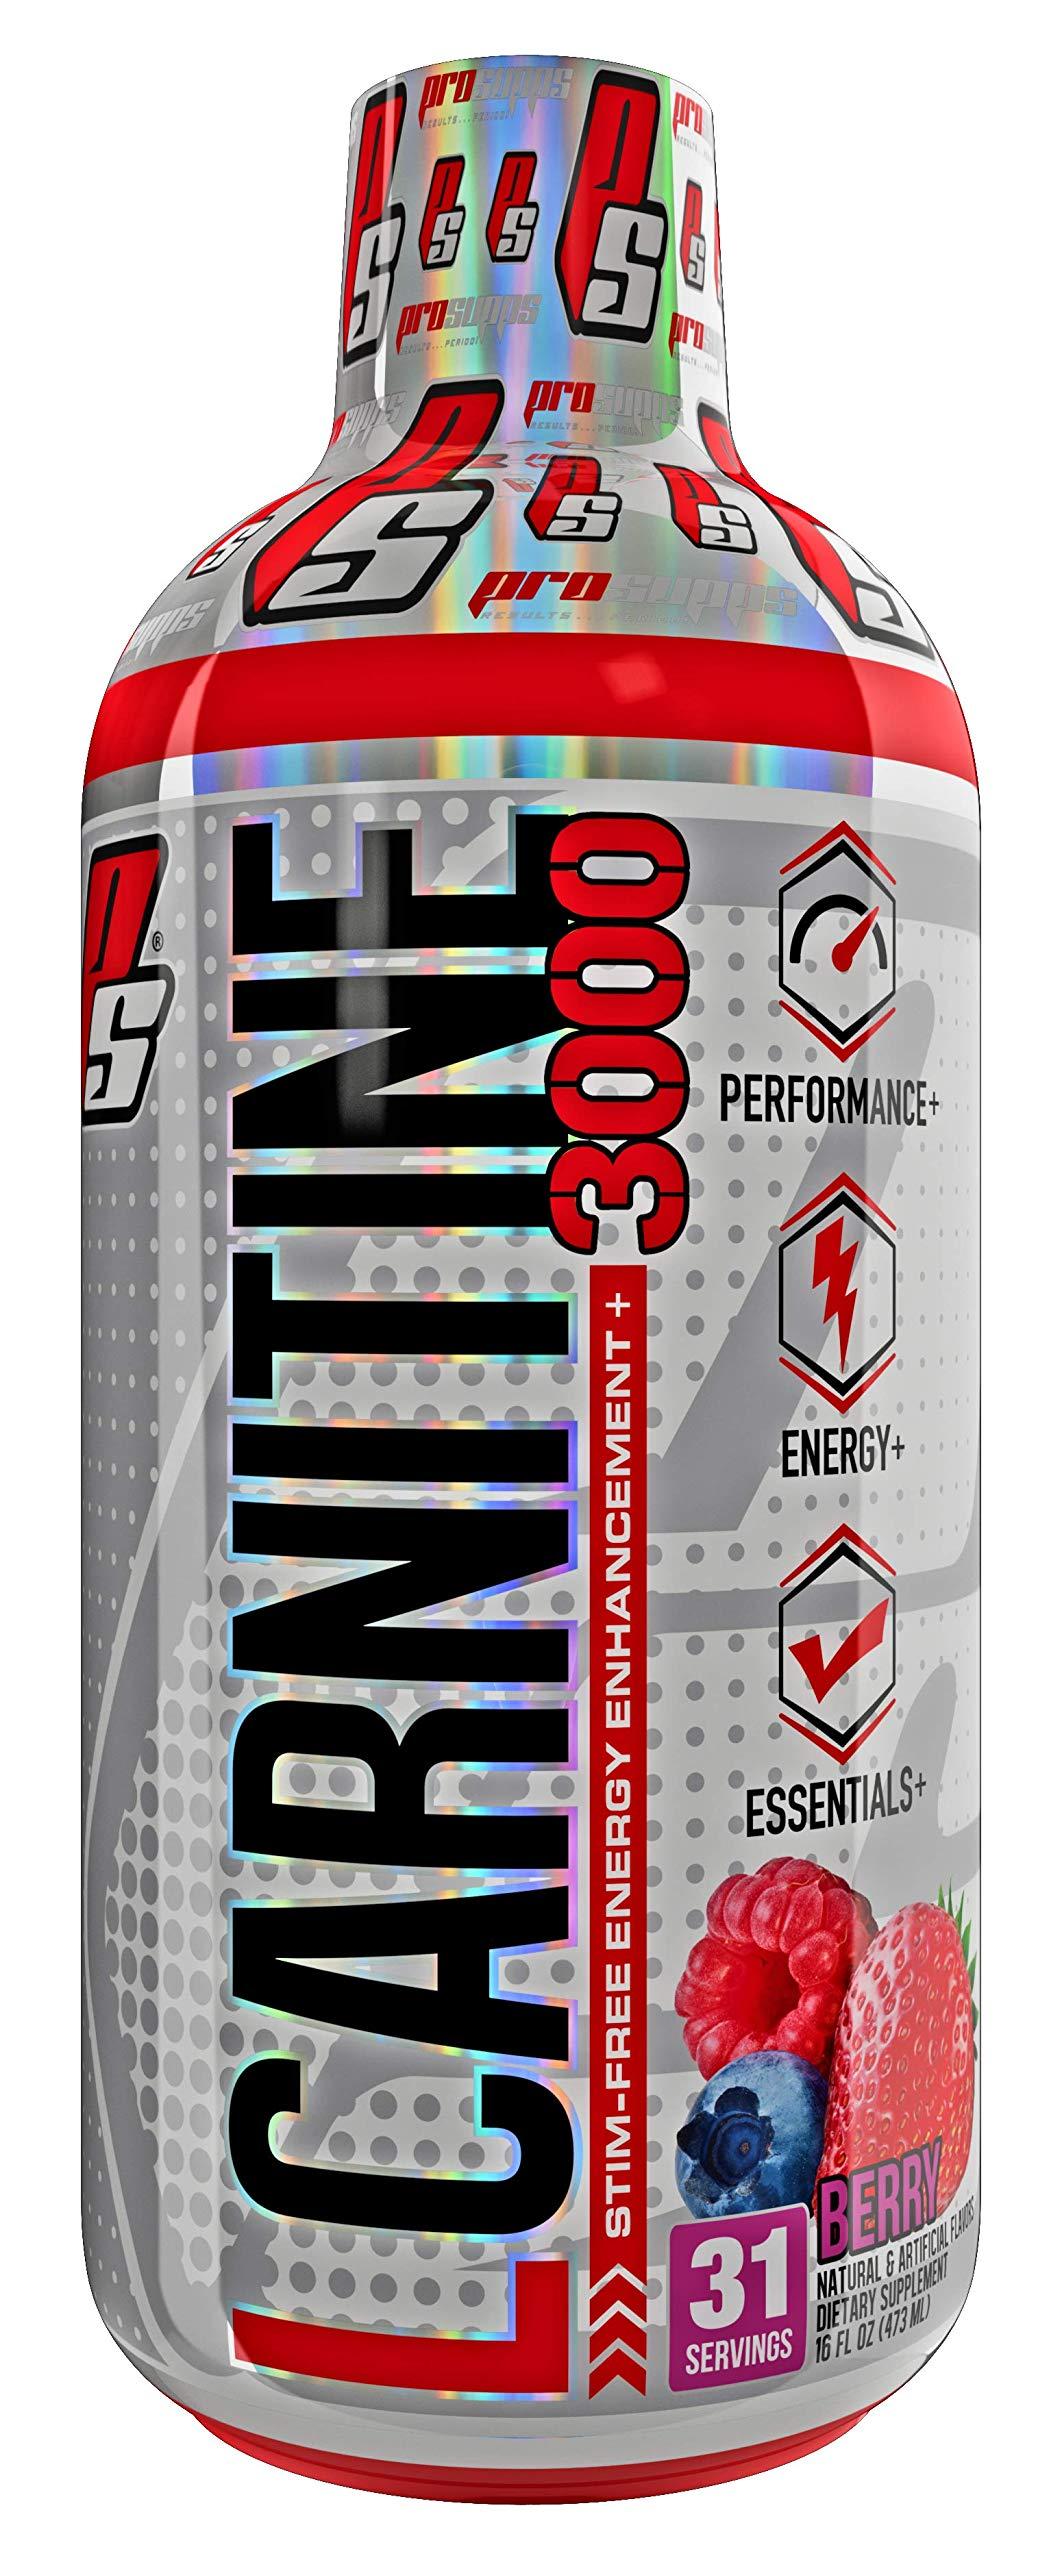 ProSupps L-Carnitine 3000 Liquid Fat Burner, Stimulant Free Metabolic Enhancer, 31 Servings (Berry Flavor)